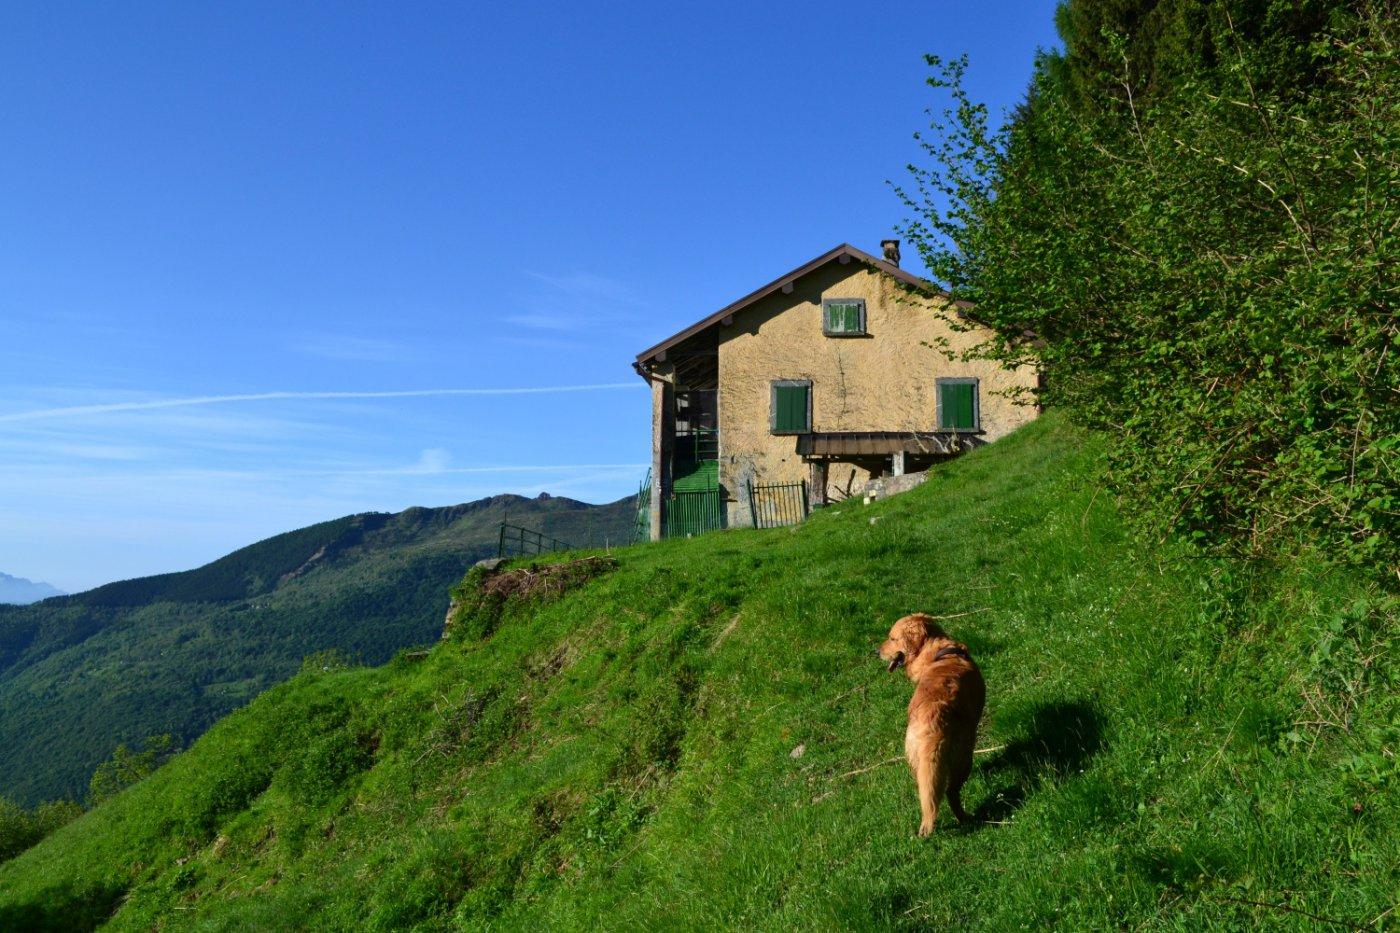 arrivo al Rifugio Vincino (1168 m)